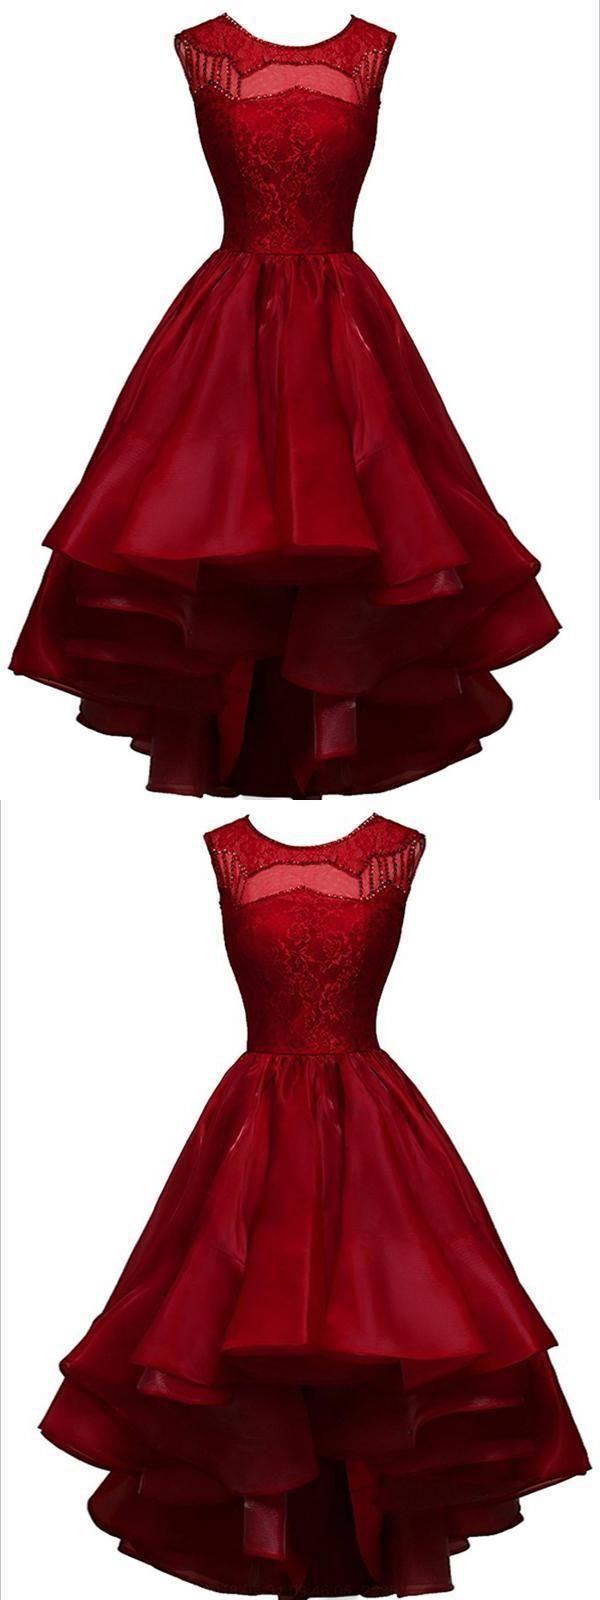 Customized easy prom dresses prom dresses short prom dresses